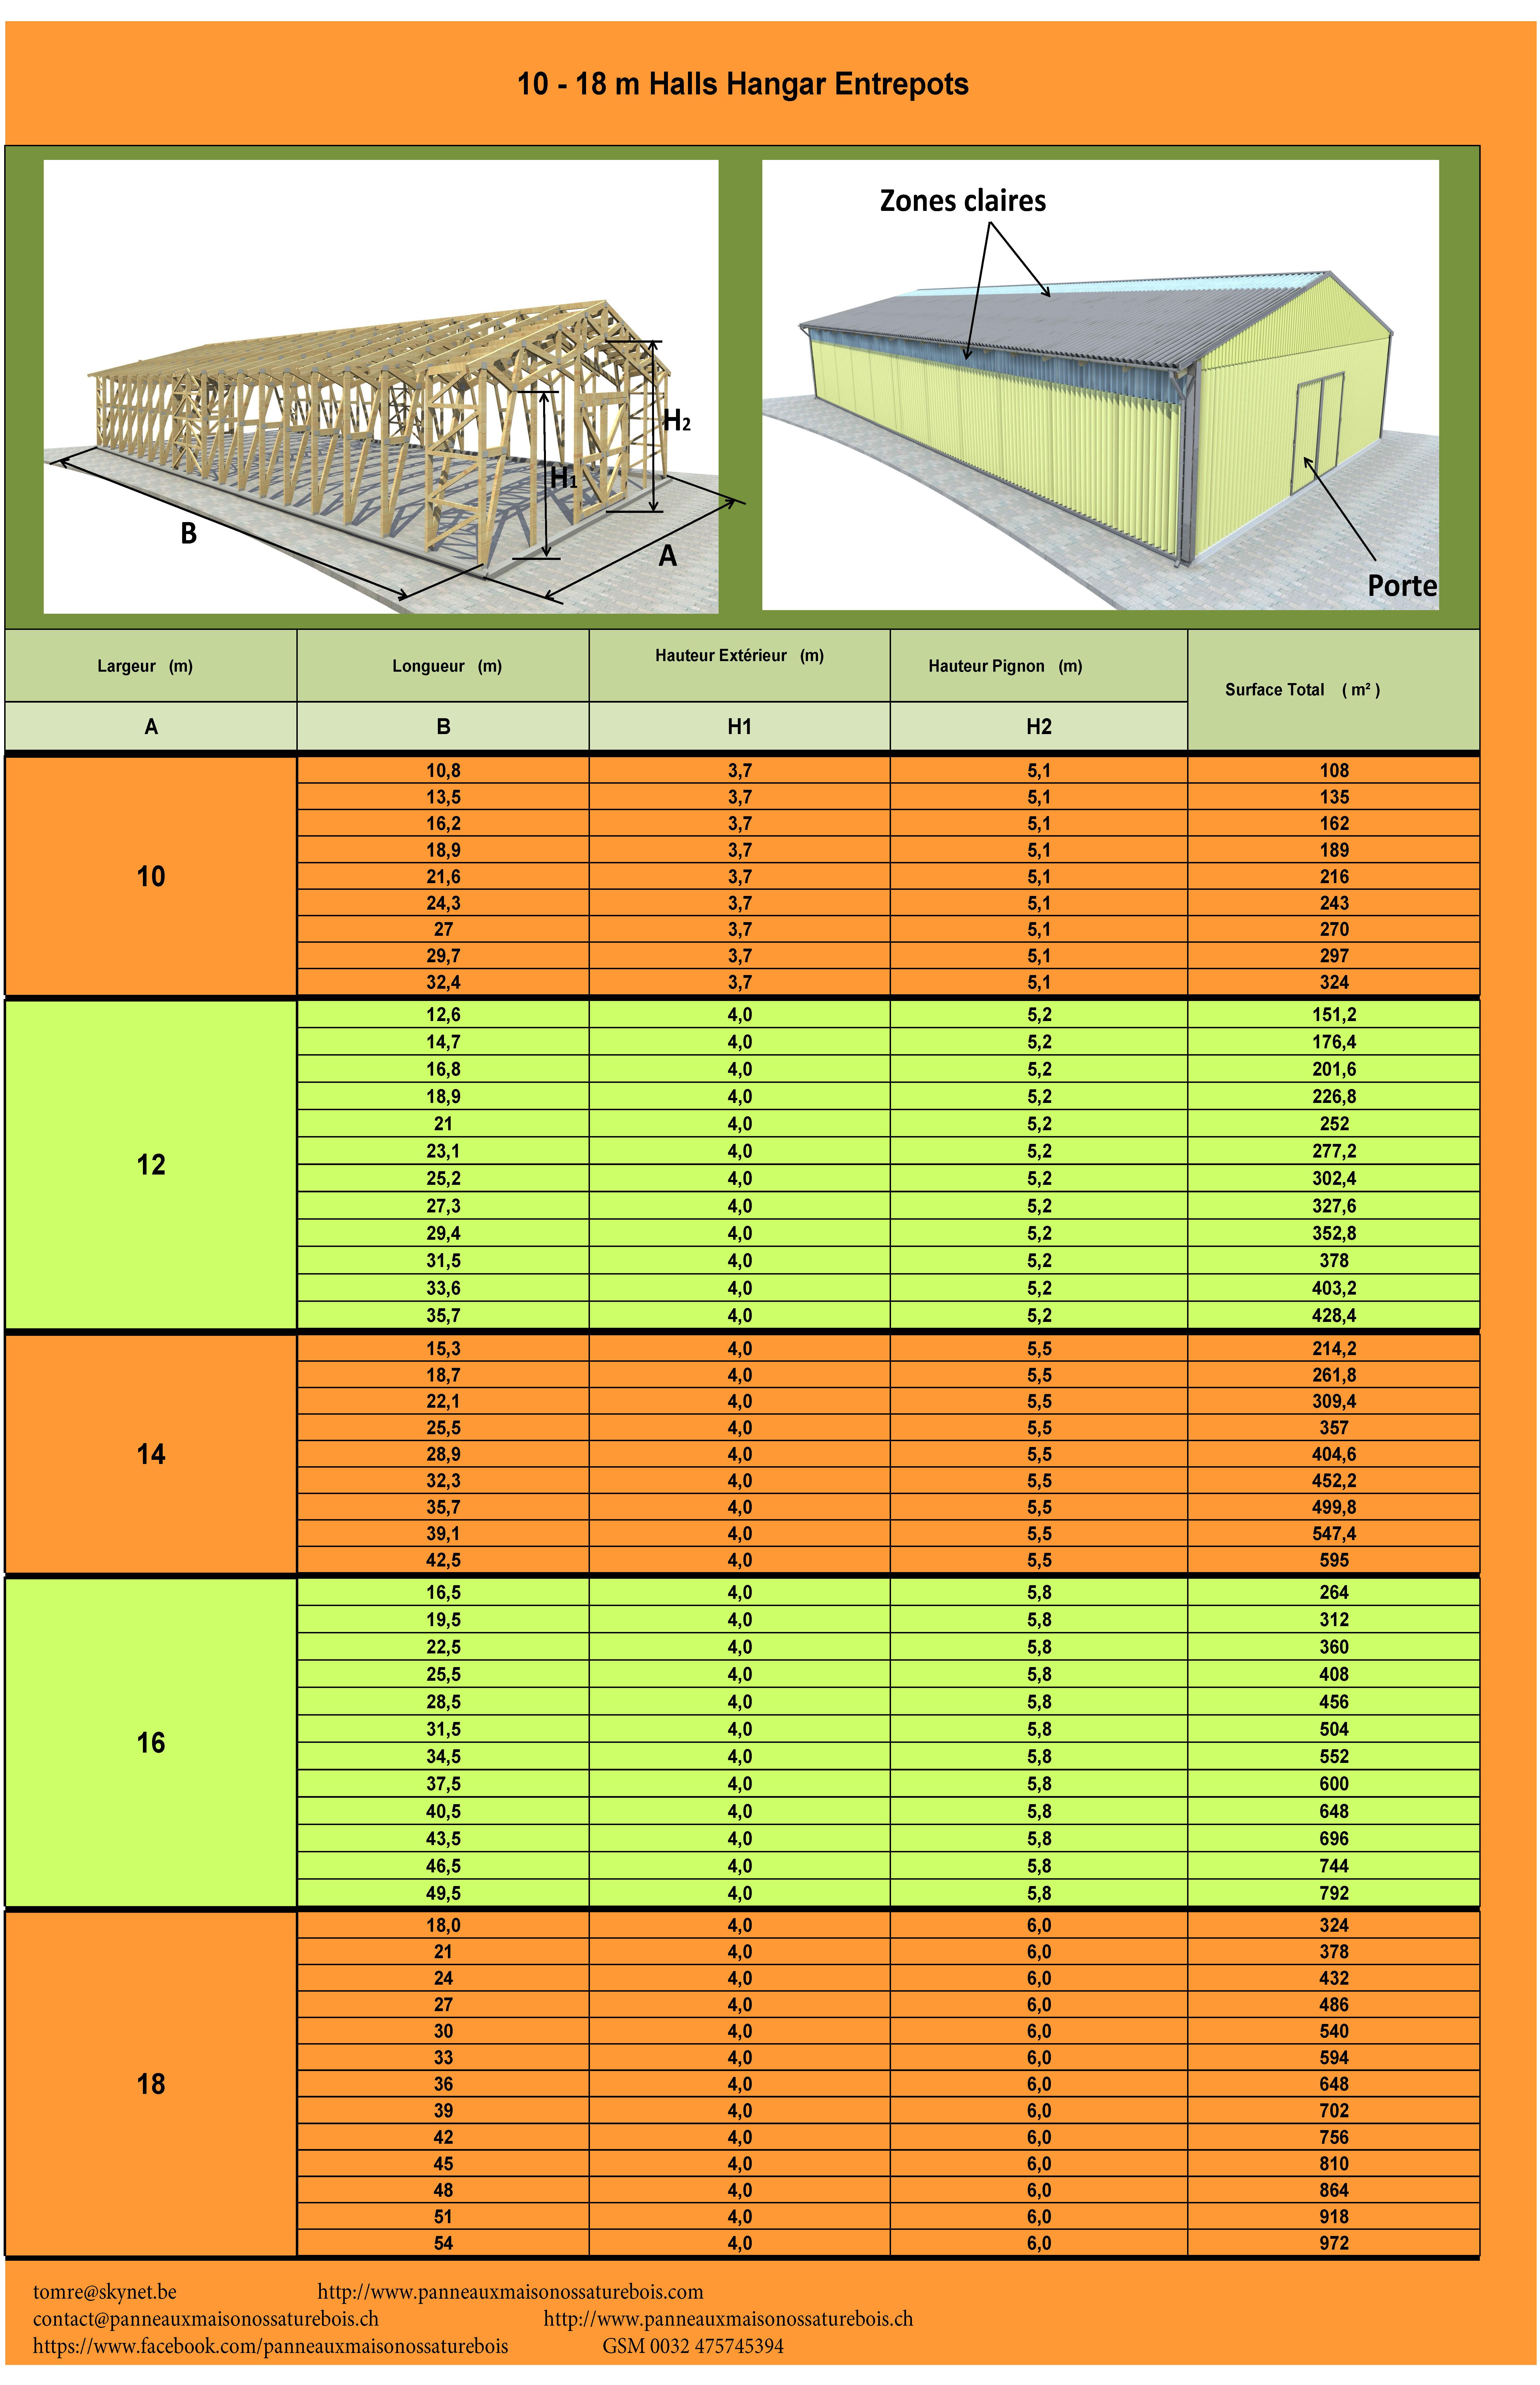 LV Hangar Entrepots Halls 10-18m